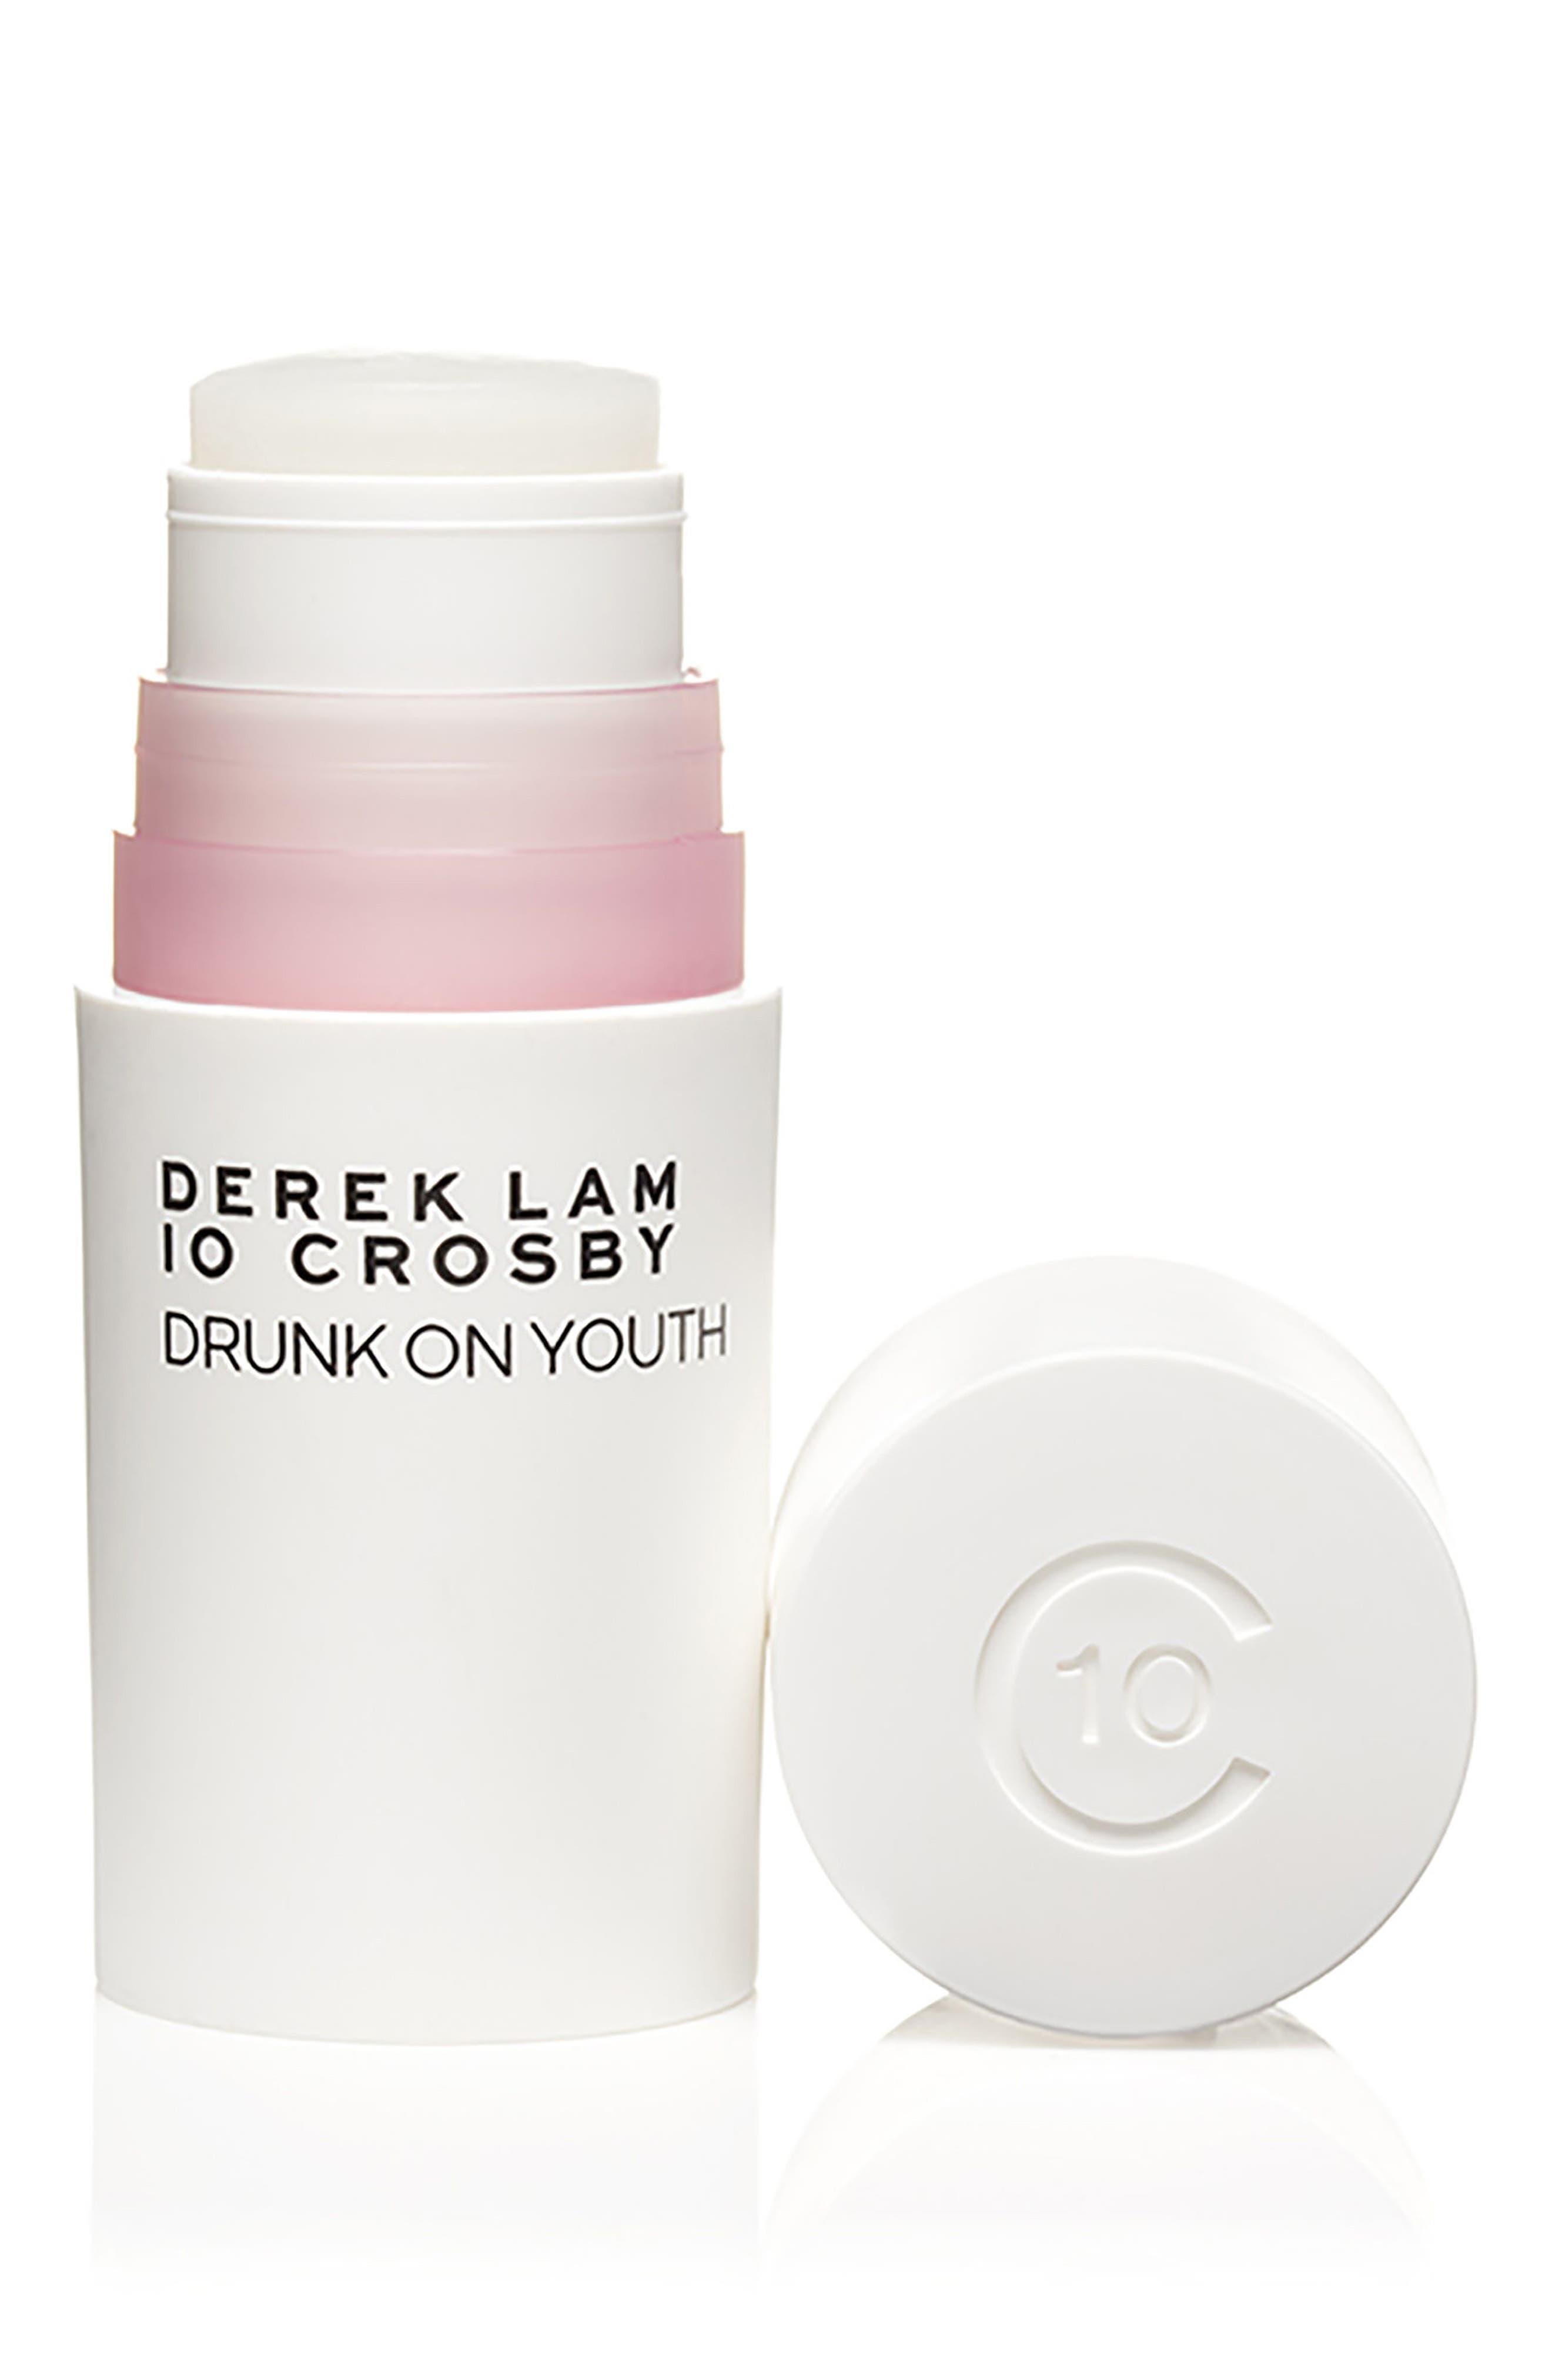 Derek Lam Drunk on Youth 10 Crosby Set,                             Alternate thumbnail 4, color,                             No Color